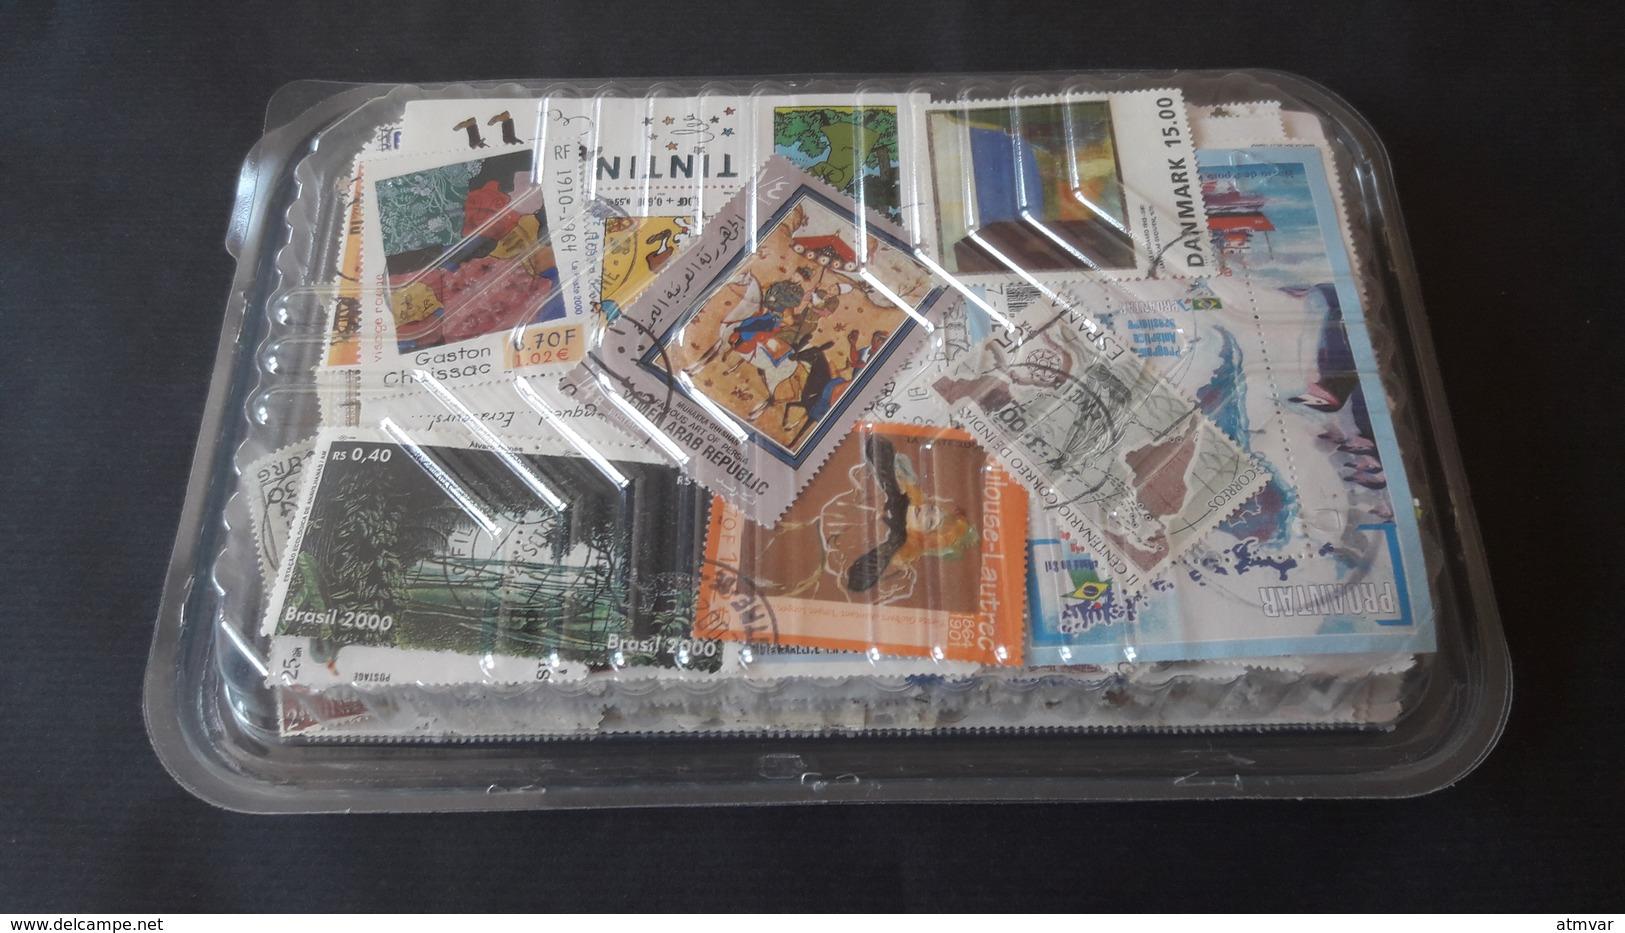 WORLDWIDE - KILOWARE 150 G. Sellos Usados, Sin Papel / Used Stamps, No Paper / Timbres Oblitérés, Sans Papier - Mezclas (max 999 Sellos)